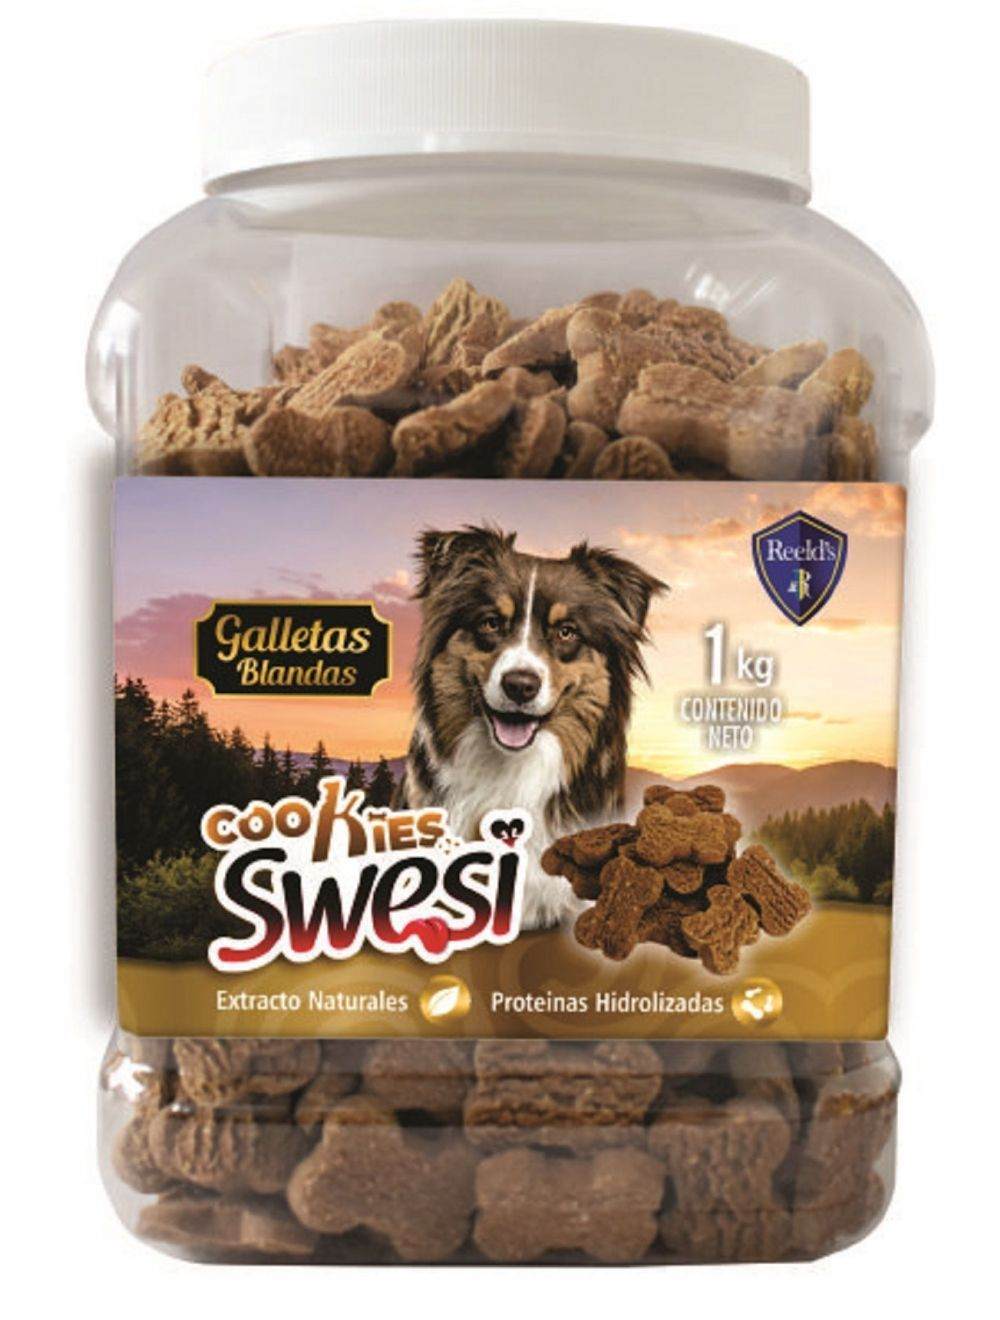 Cookies Swesi Bombonera-Galletas para Perros 1 kg